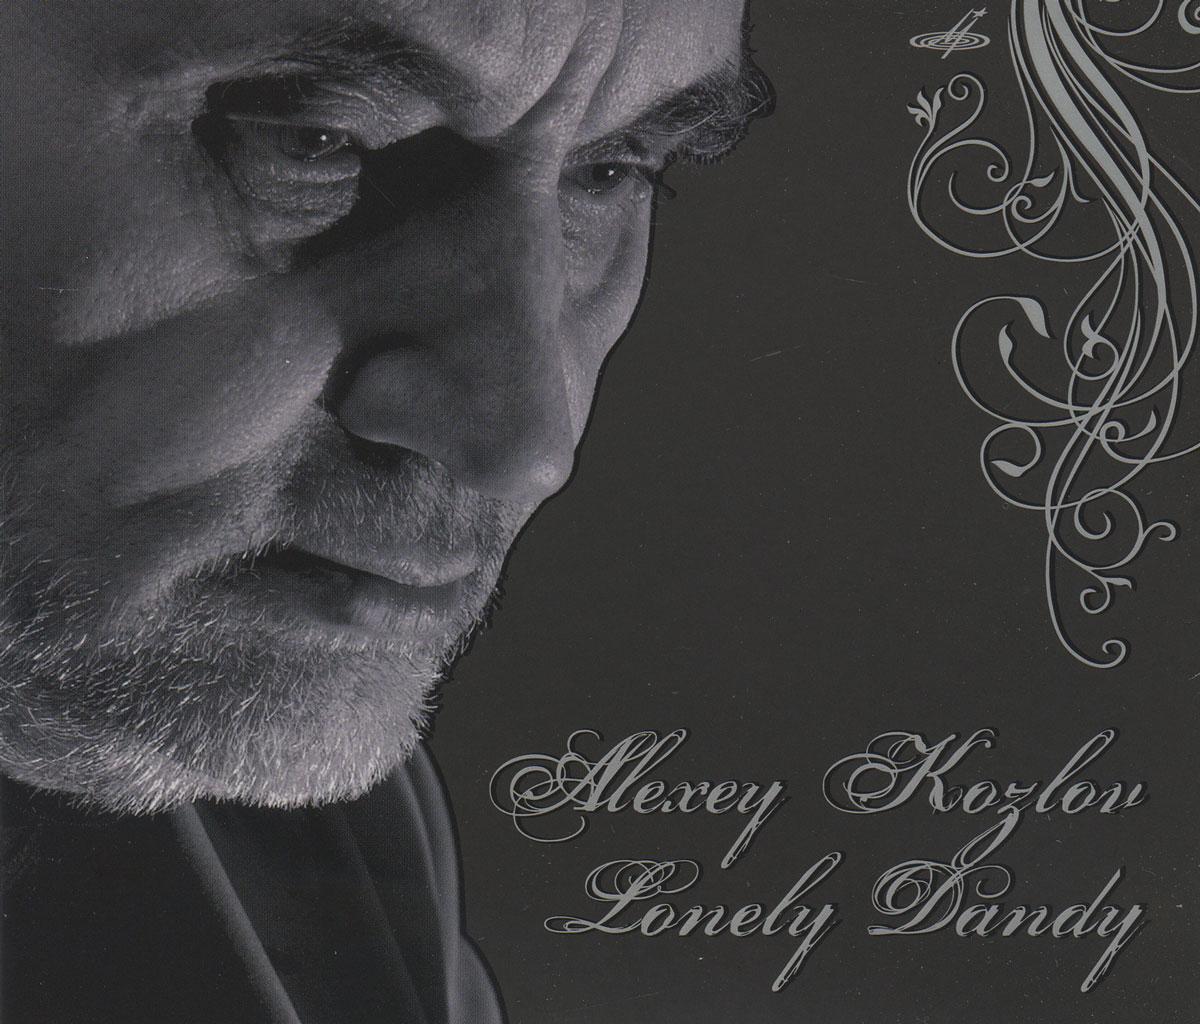 Алексей Козлов Alexey Kozlov. Lonely Dandy алексей козлов и группа арсенал 2019 08 31t20 30